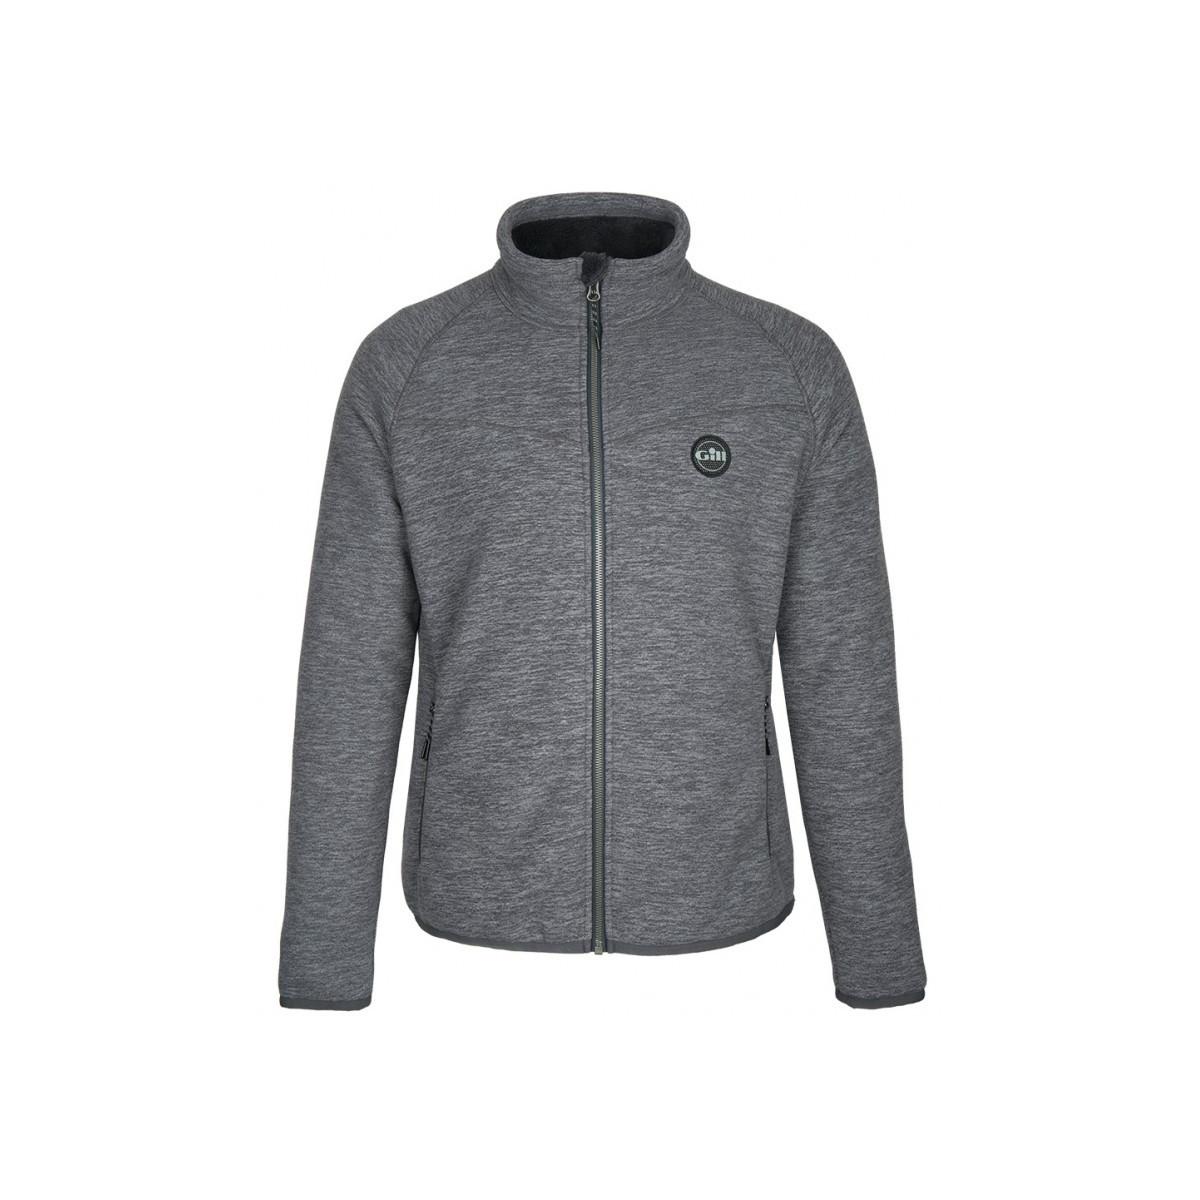 Jacke Herren Fleece Polar graphite Jacket Gill IDW29EH